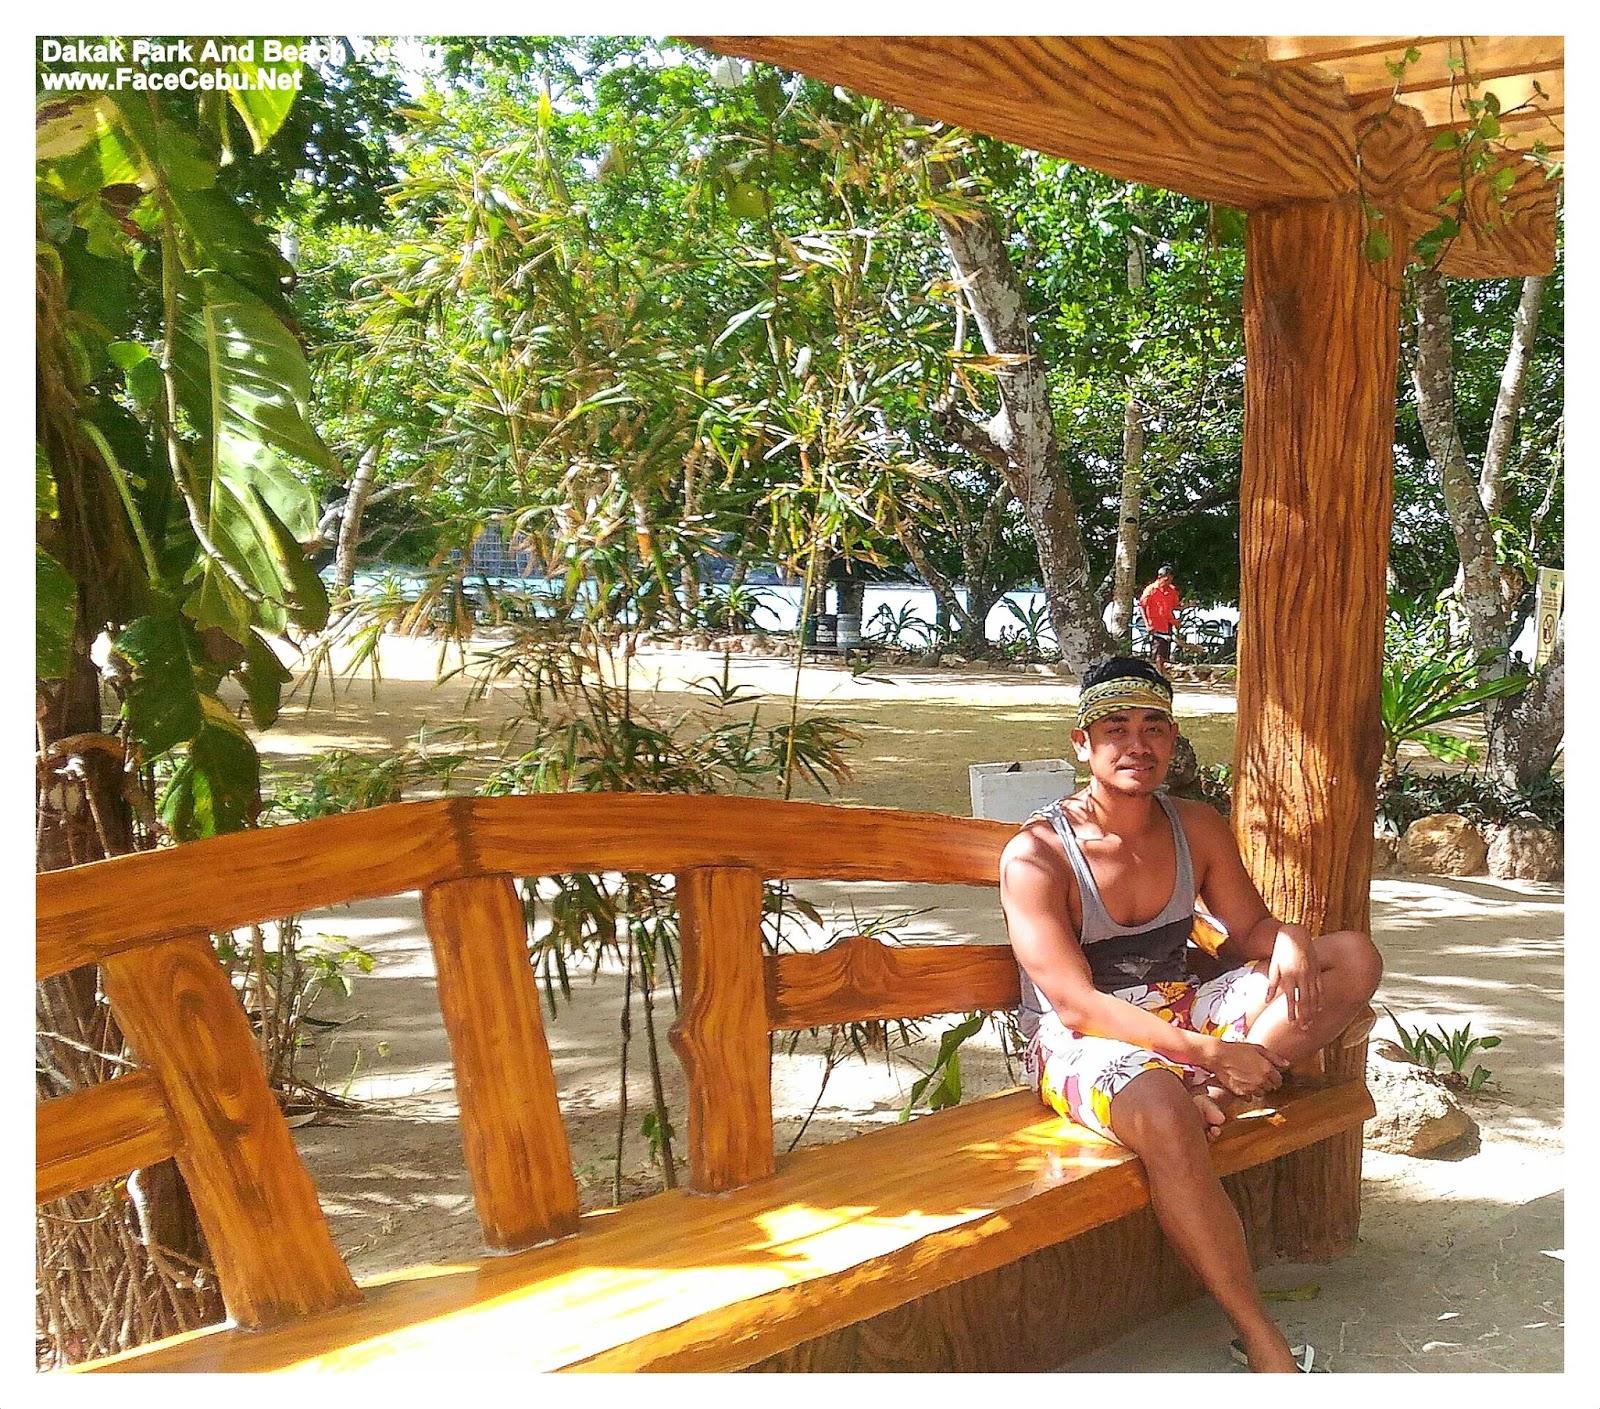 Dakak Park And Beach Resort Contact Number